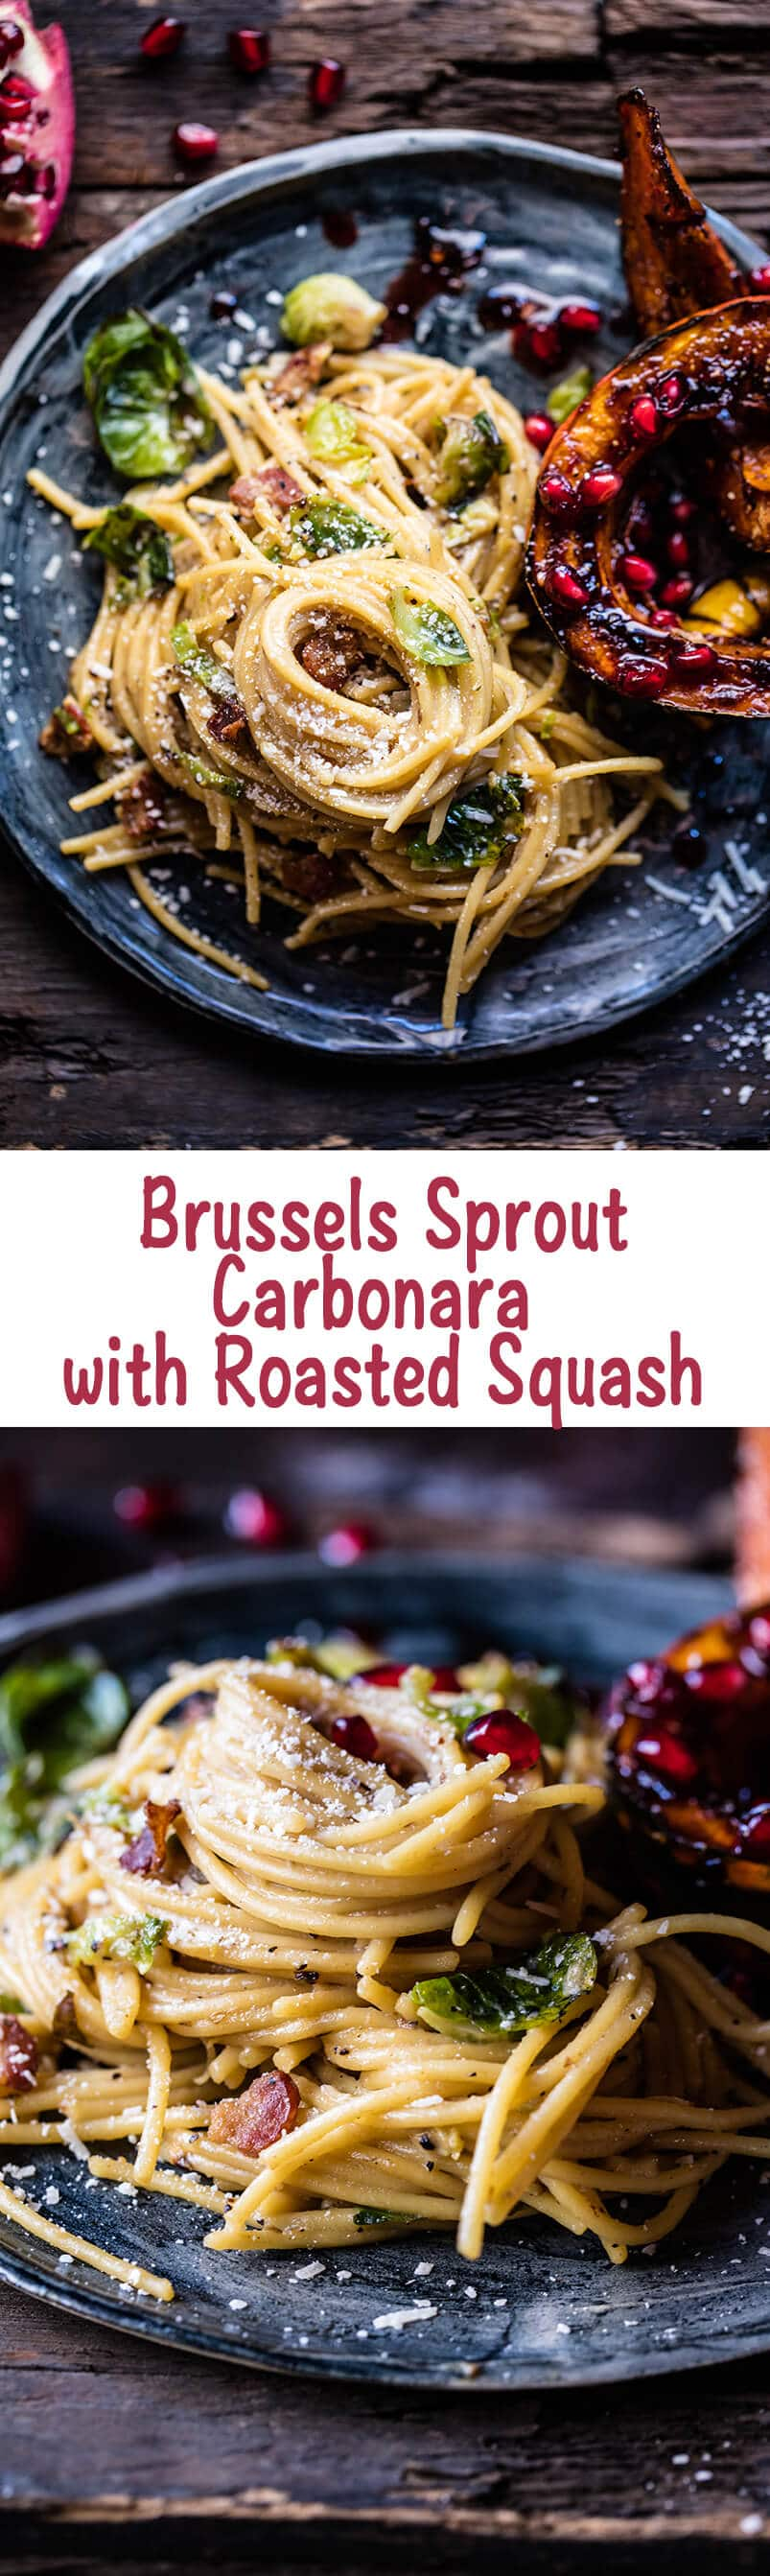 Brussels Sprout Carbonara with Pomegranate Roasted Winter Squash | halfbakedharvest.com @hbharvest